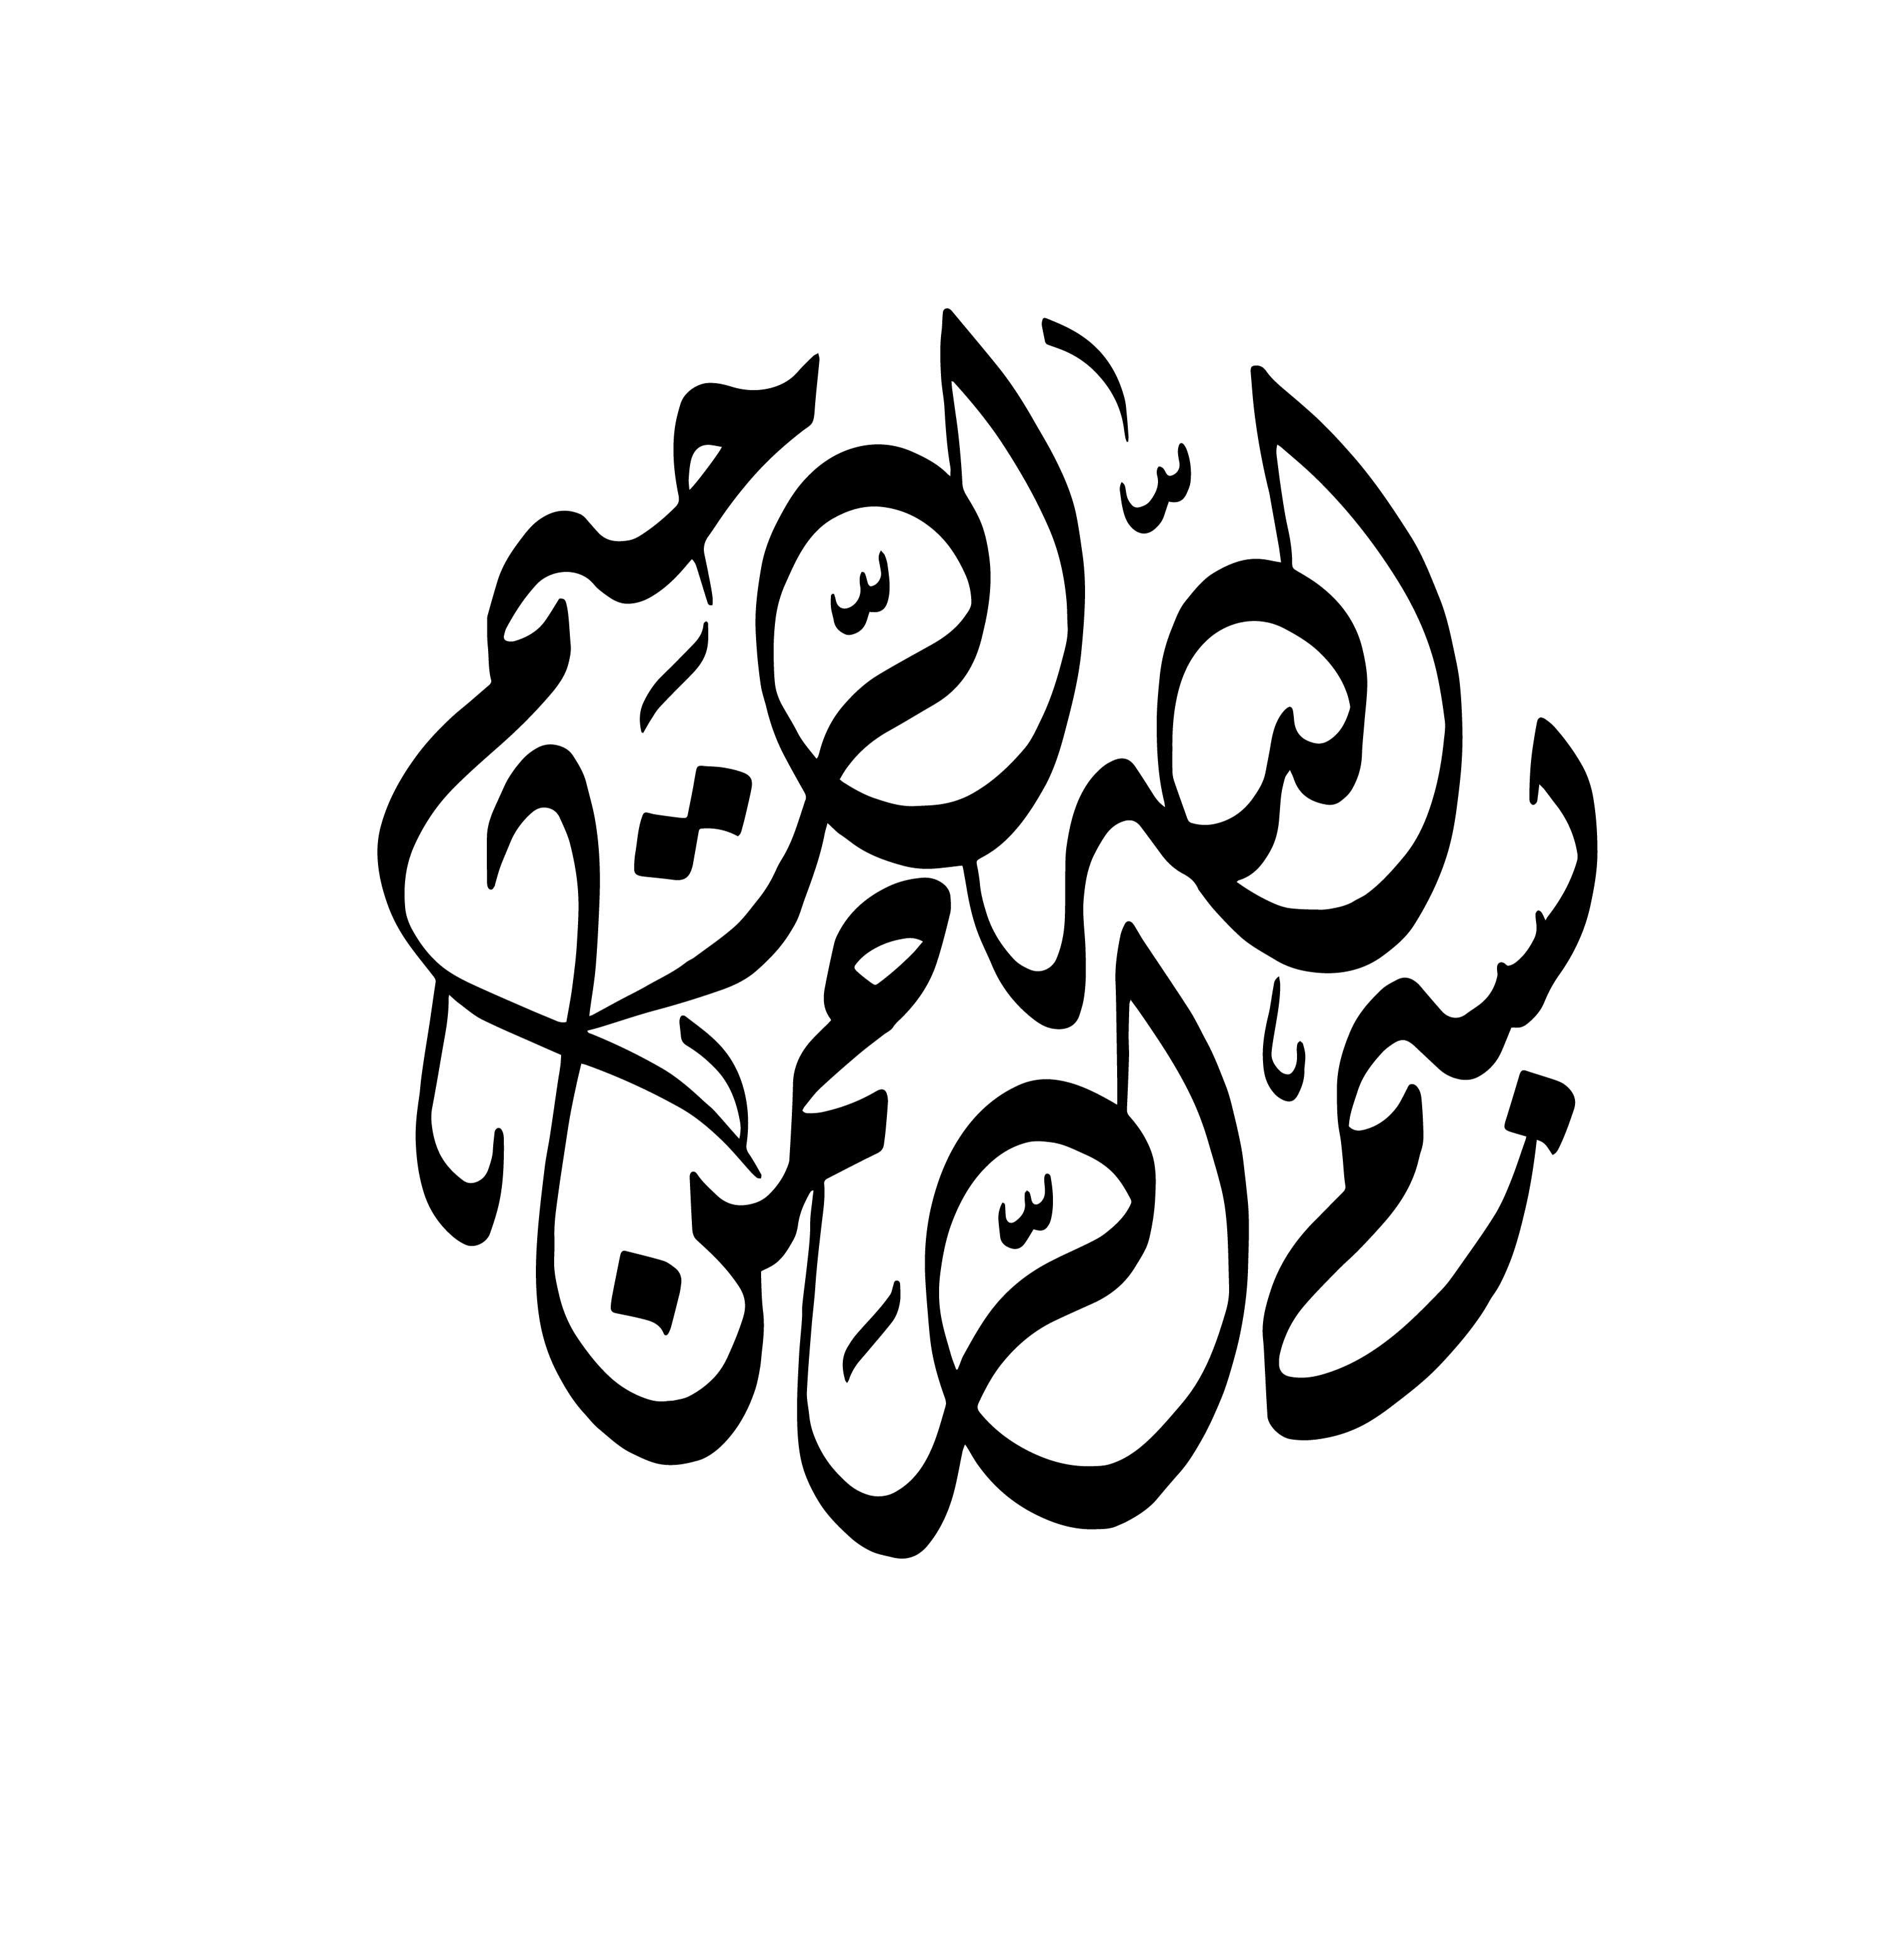 Pin kufi calligraphy font on pinterest